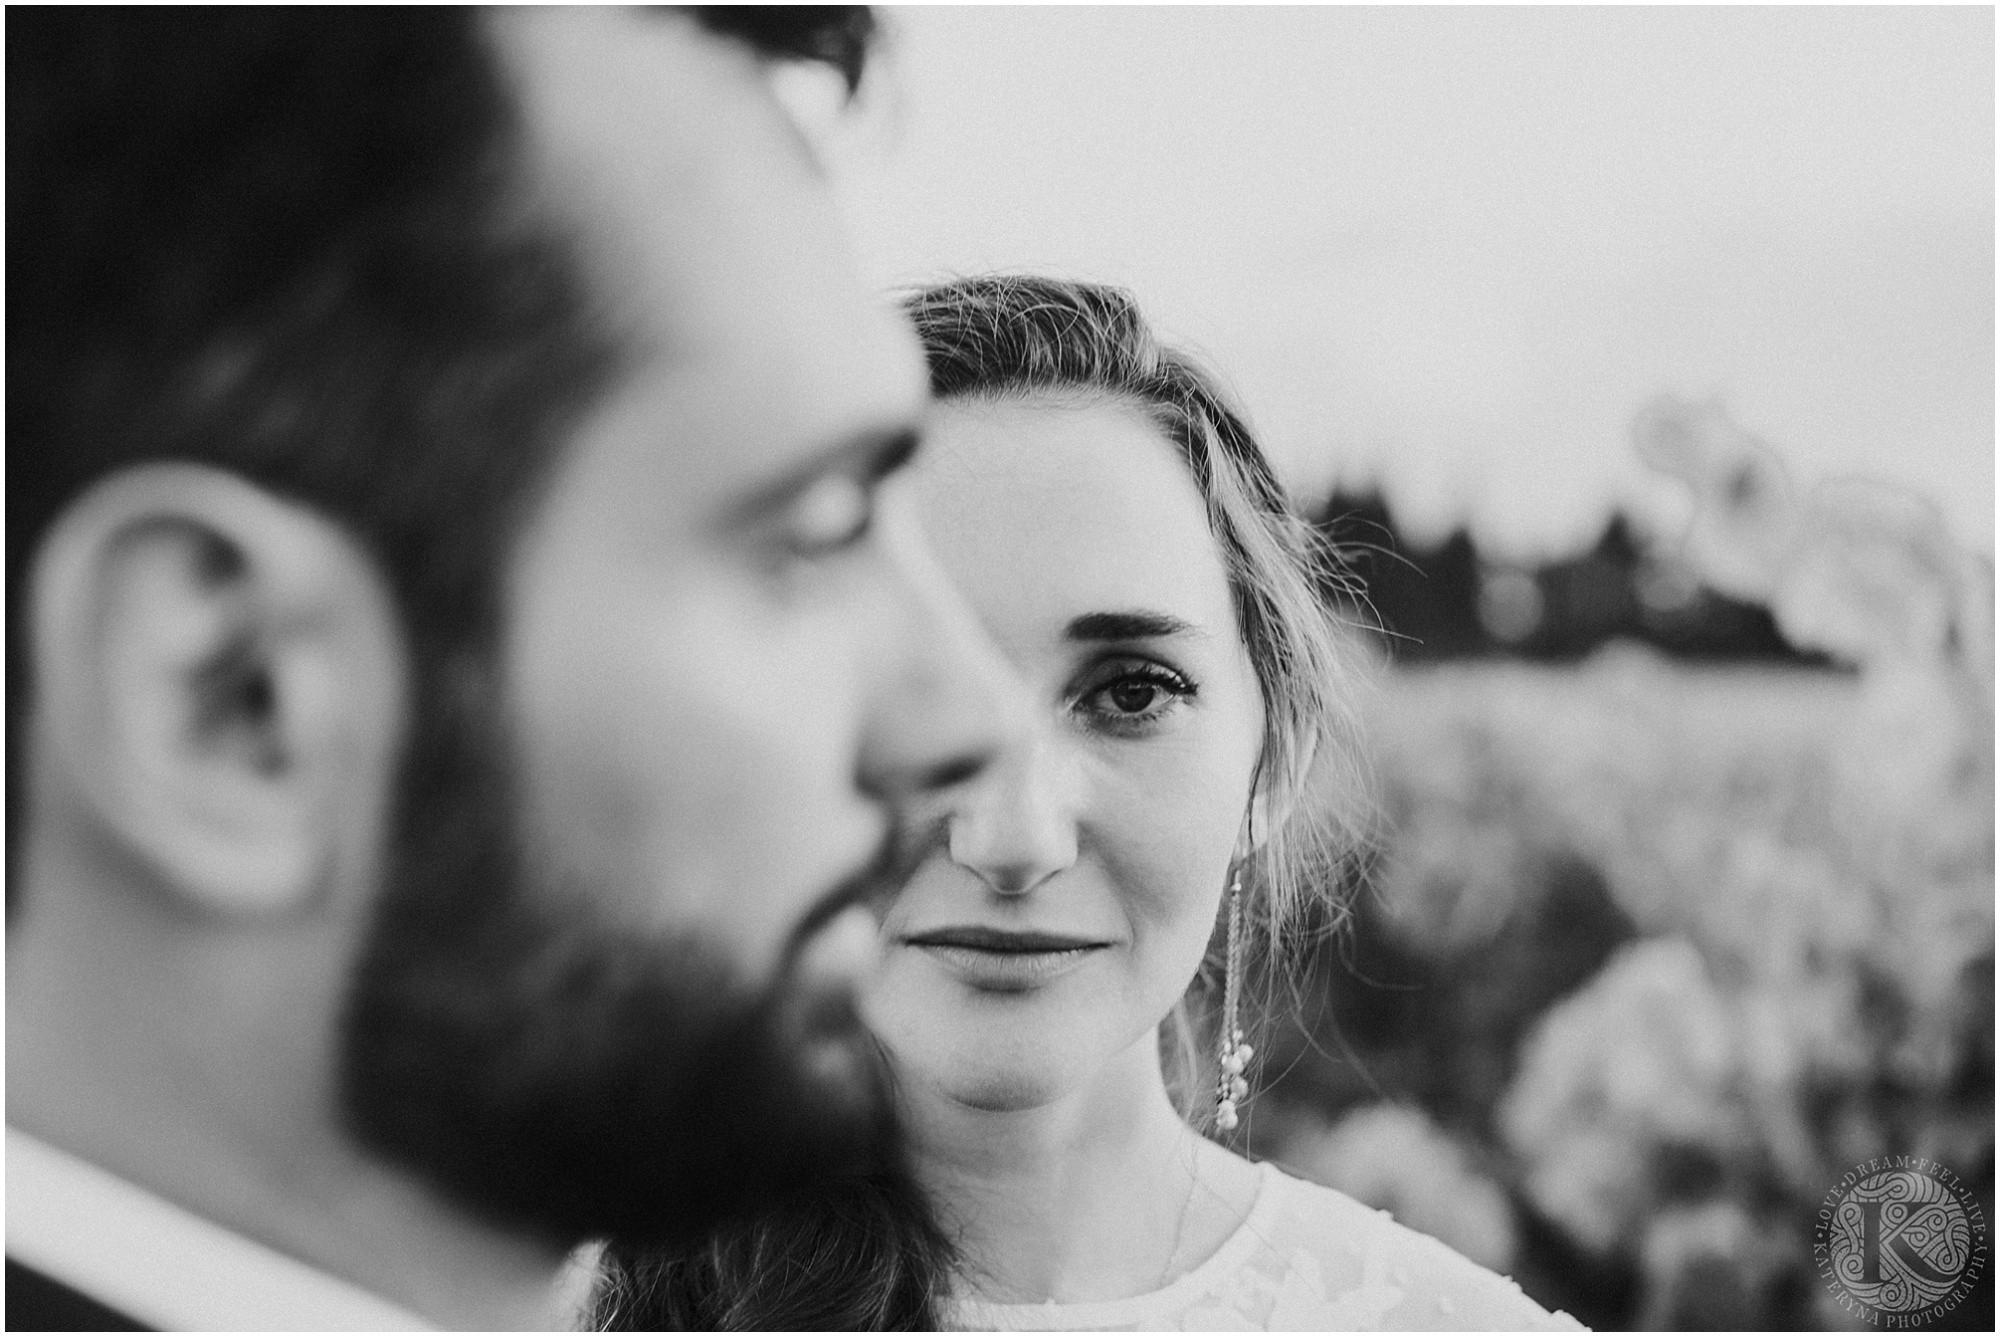 Kateryna-photos-photographe-mariage-vaucluse-provence-avignon-ferme-st-hugues_0081.jpg